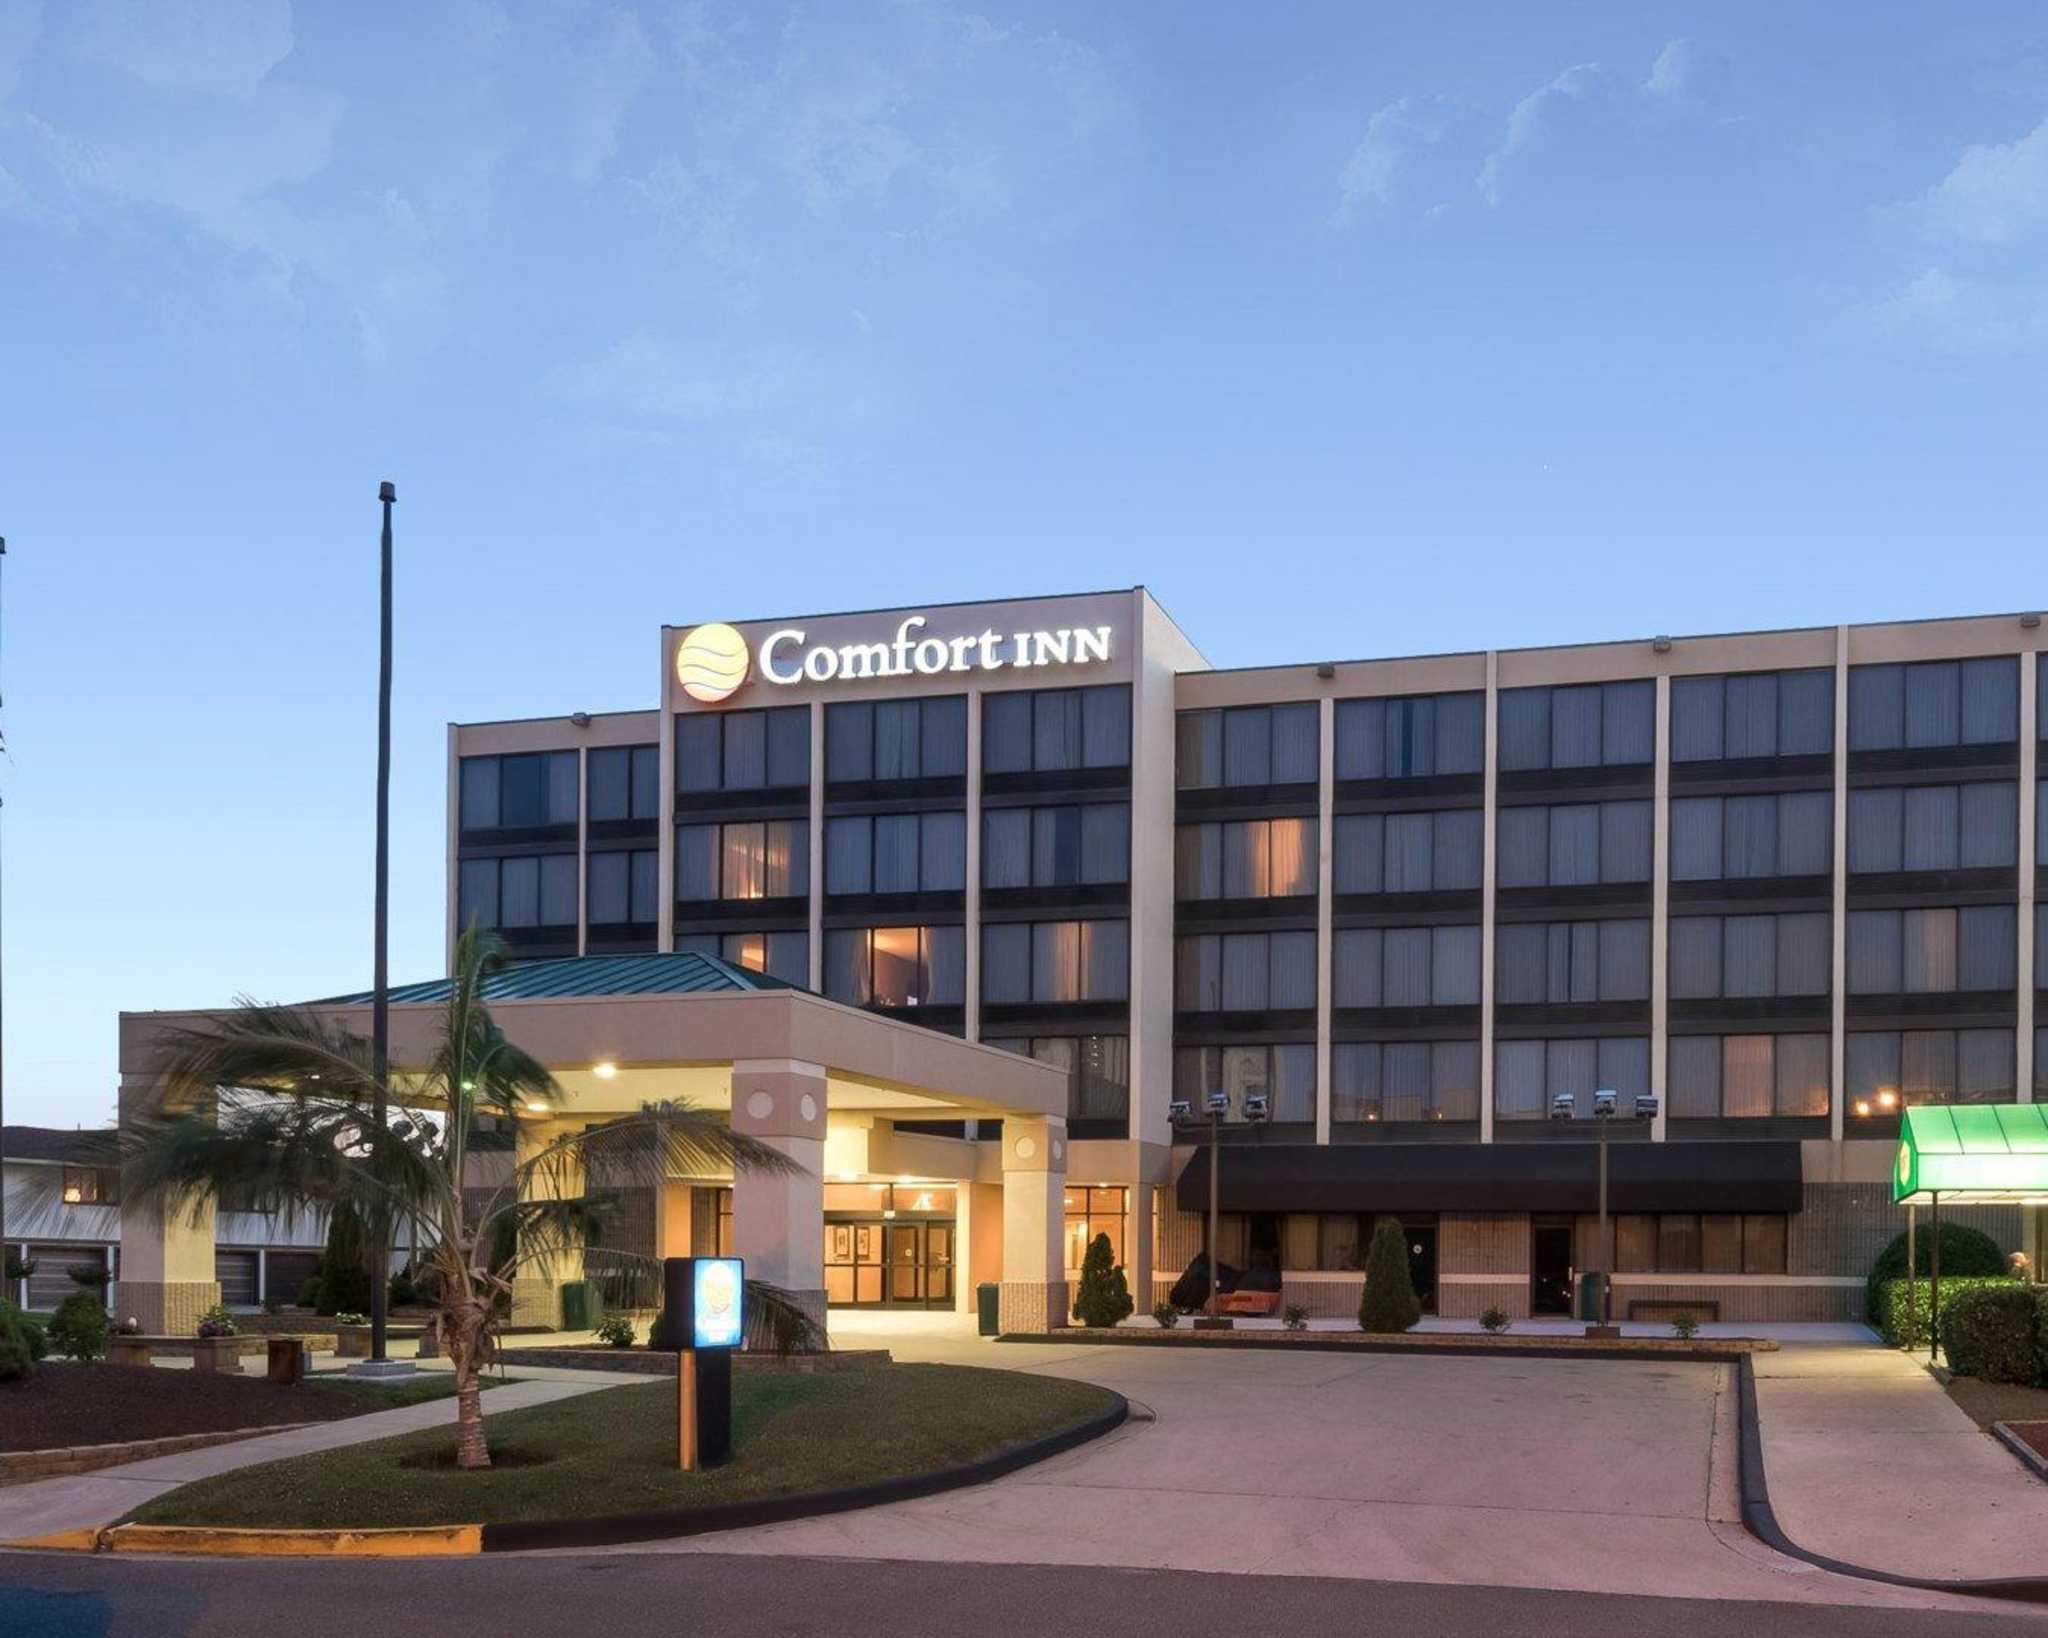 Comfort Inn Gold Coast image 2